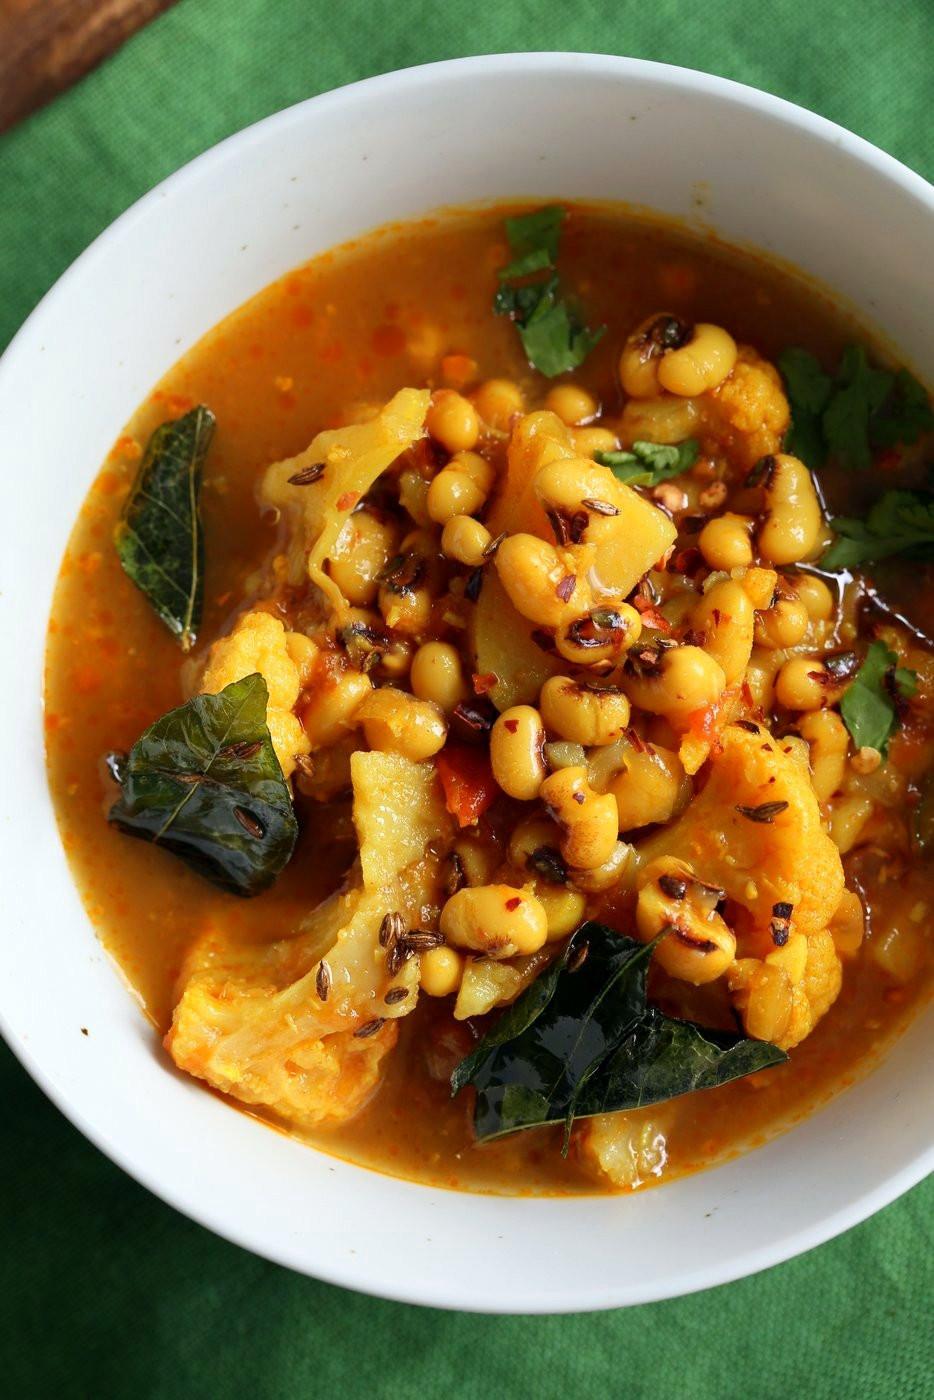 Vegan Black Eyed Pea Recipes  20 Vegan Instant Pot Recipes Vegan Richa